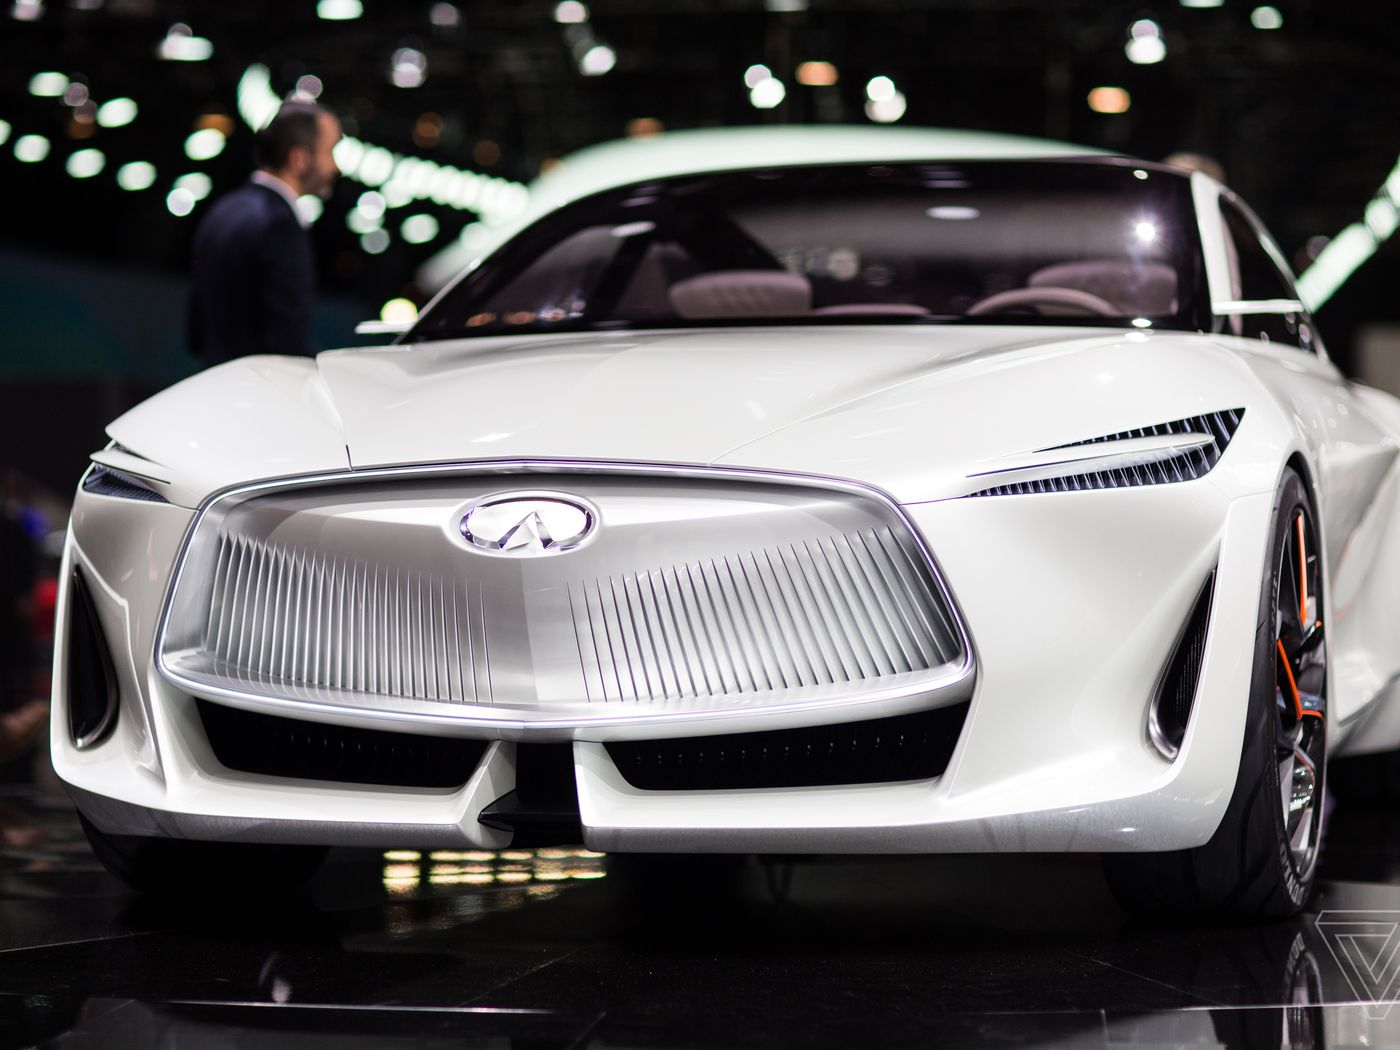 infiniti pr pare un concept car hybride sportif l 39 automobiliste. Black Bedroom Furniture Sets. Home Design Ideas